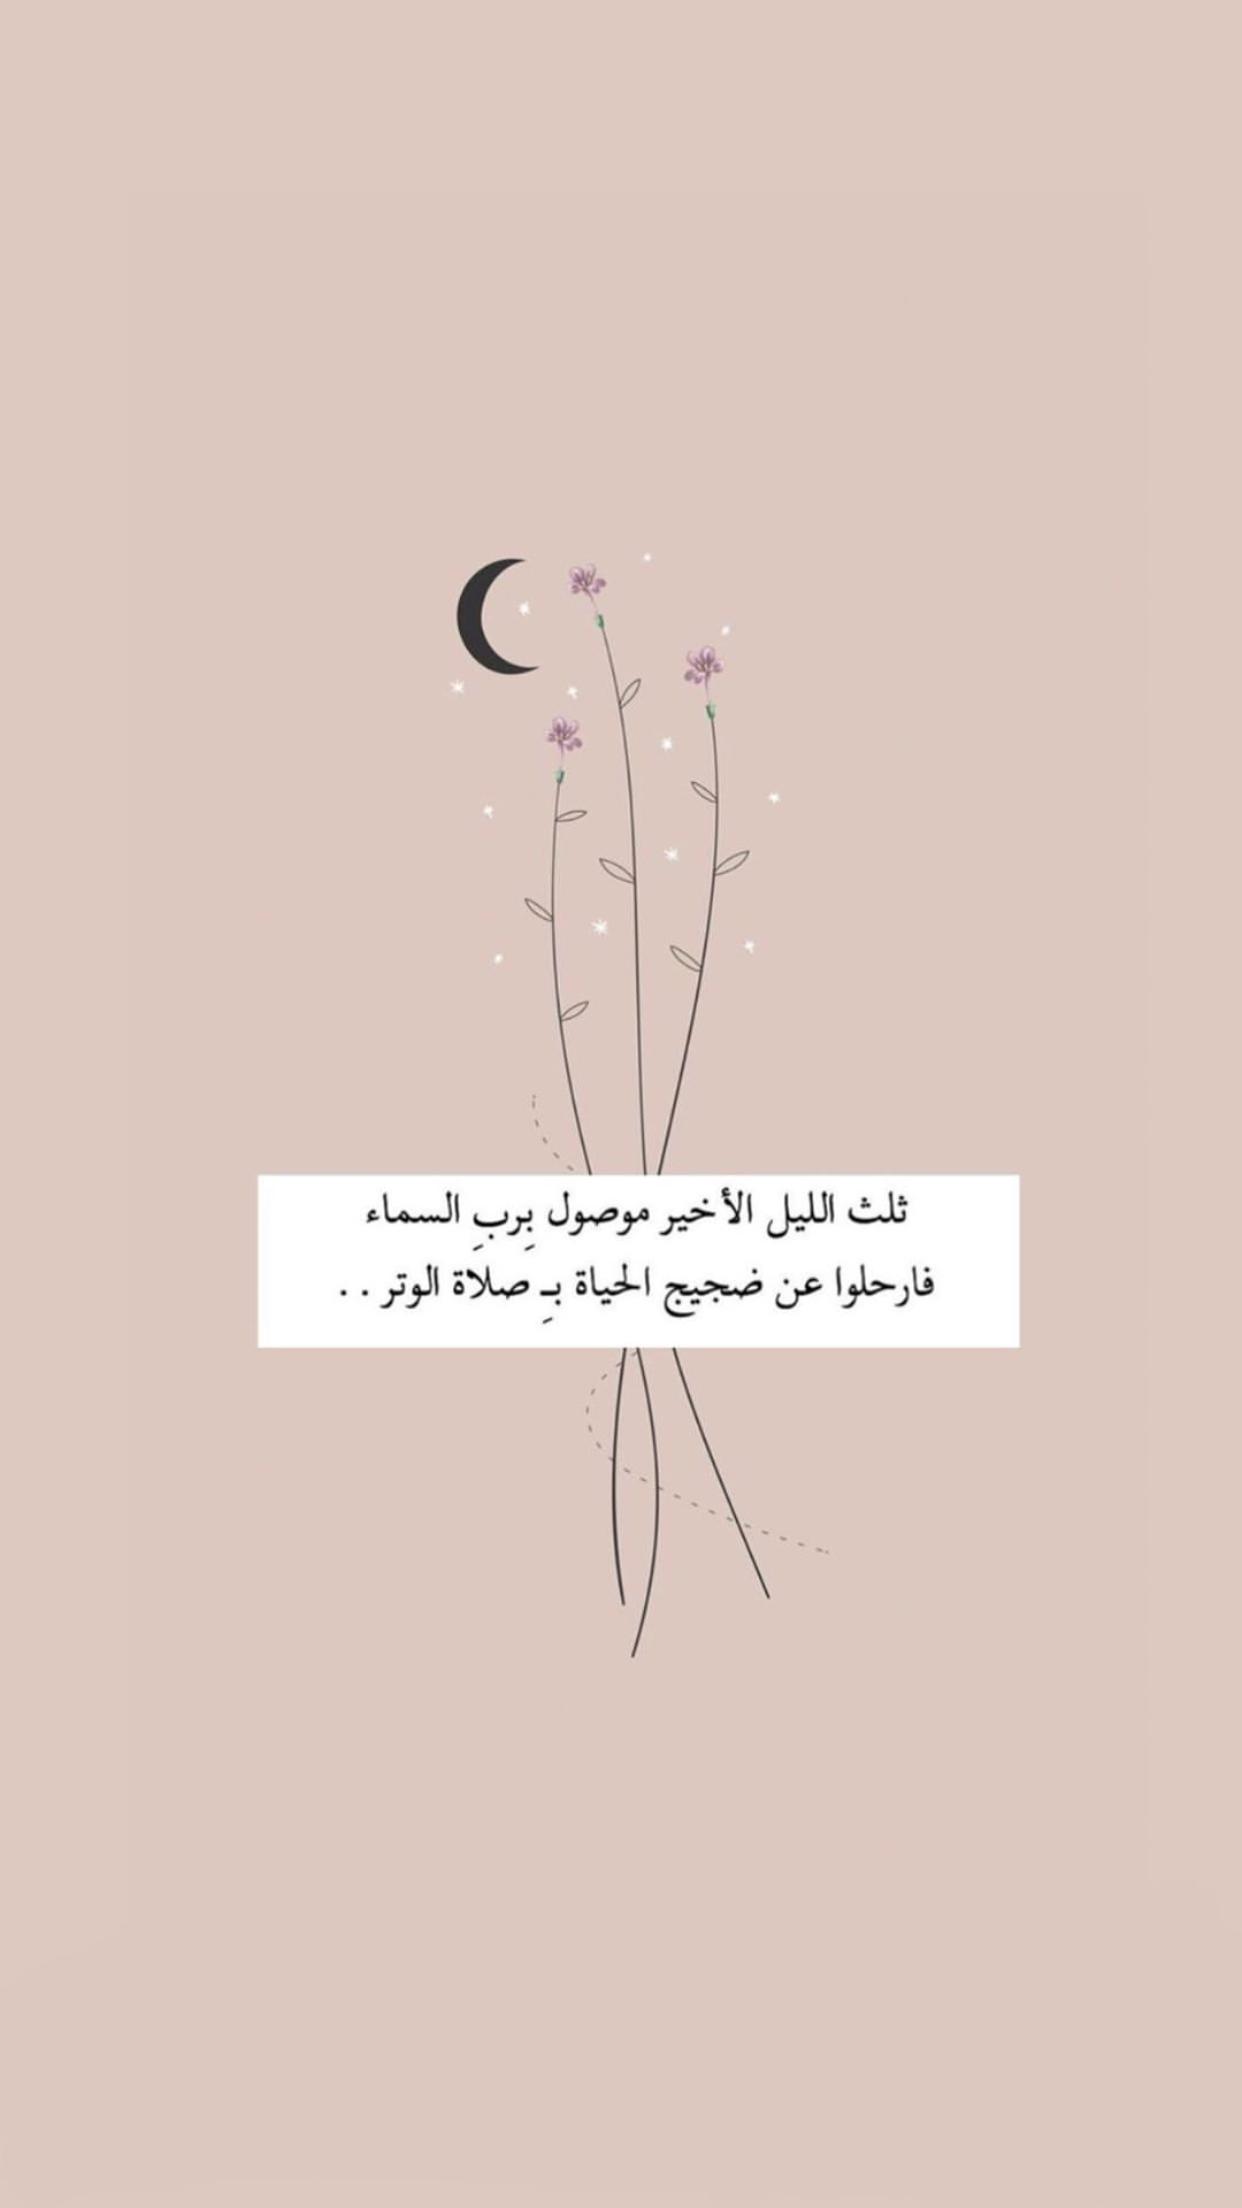 الوتر Quotes For Book Lovers Favorite Book Quotes Beautiful Arabic Words